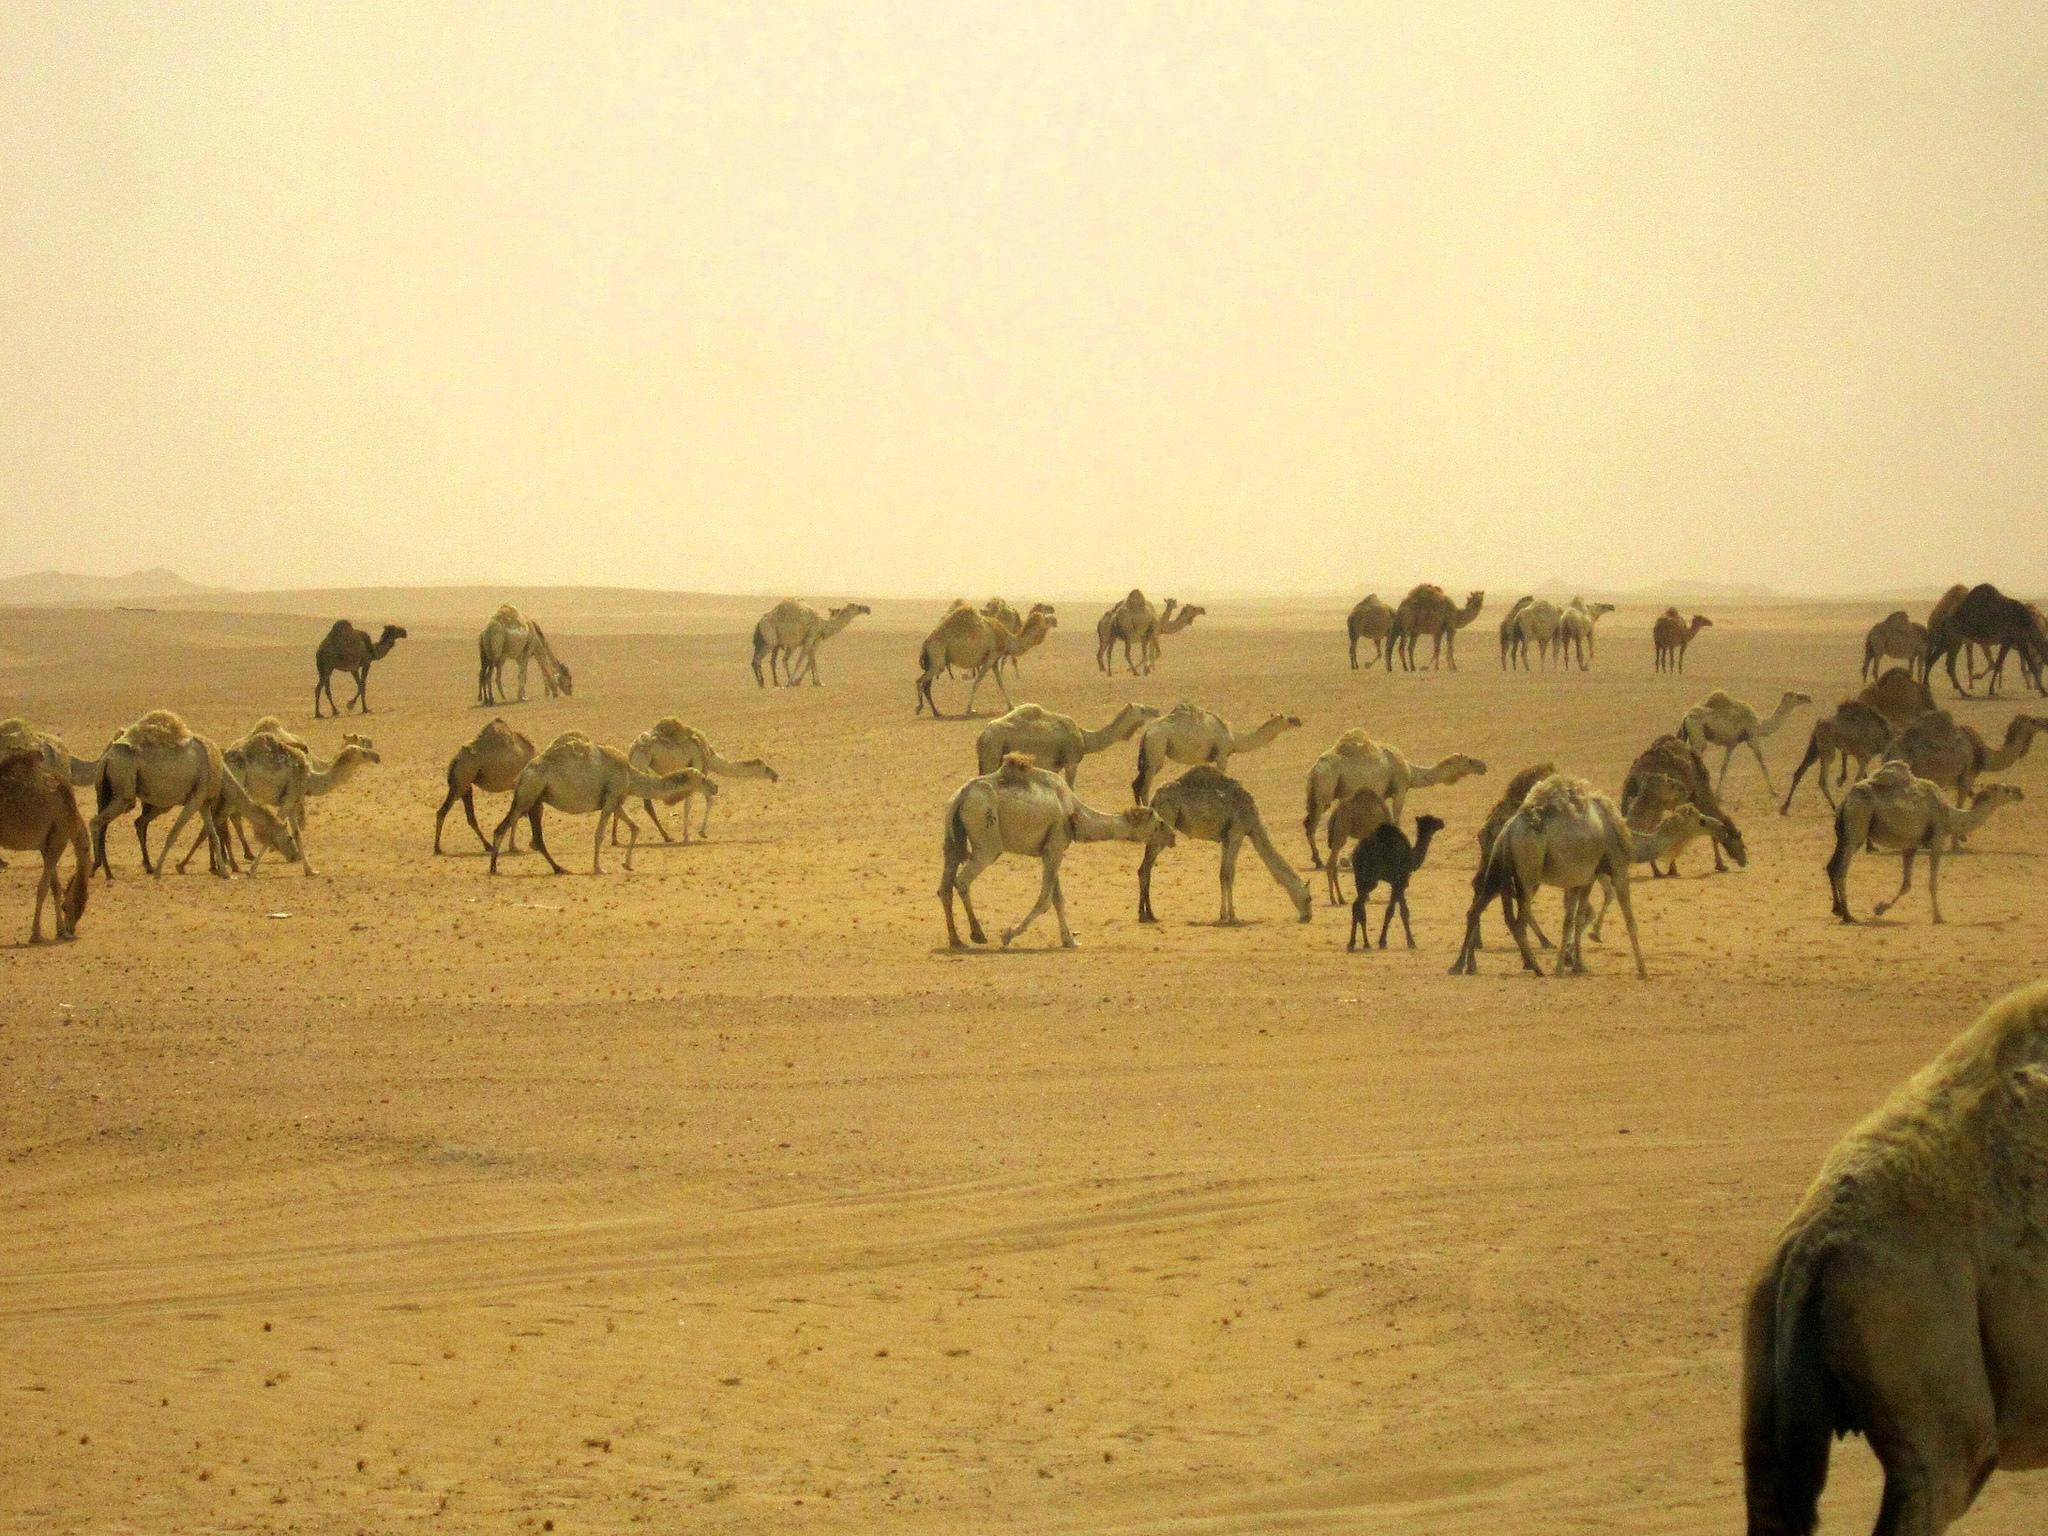 Iraq overpopulation